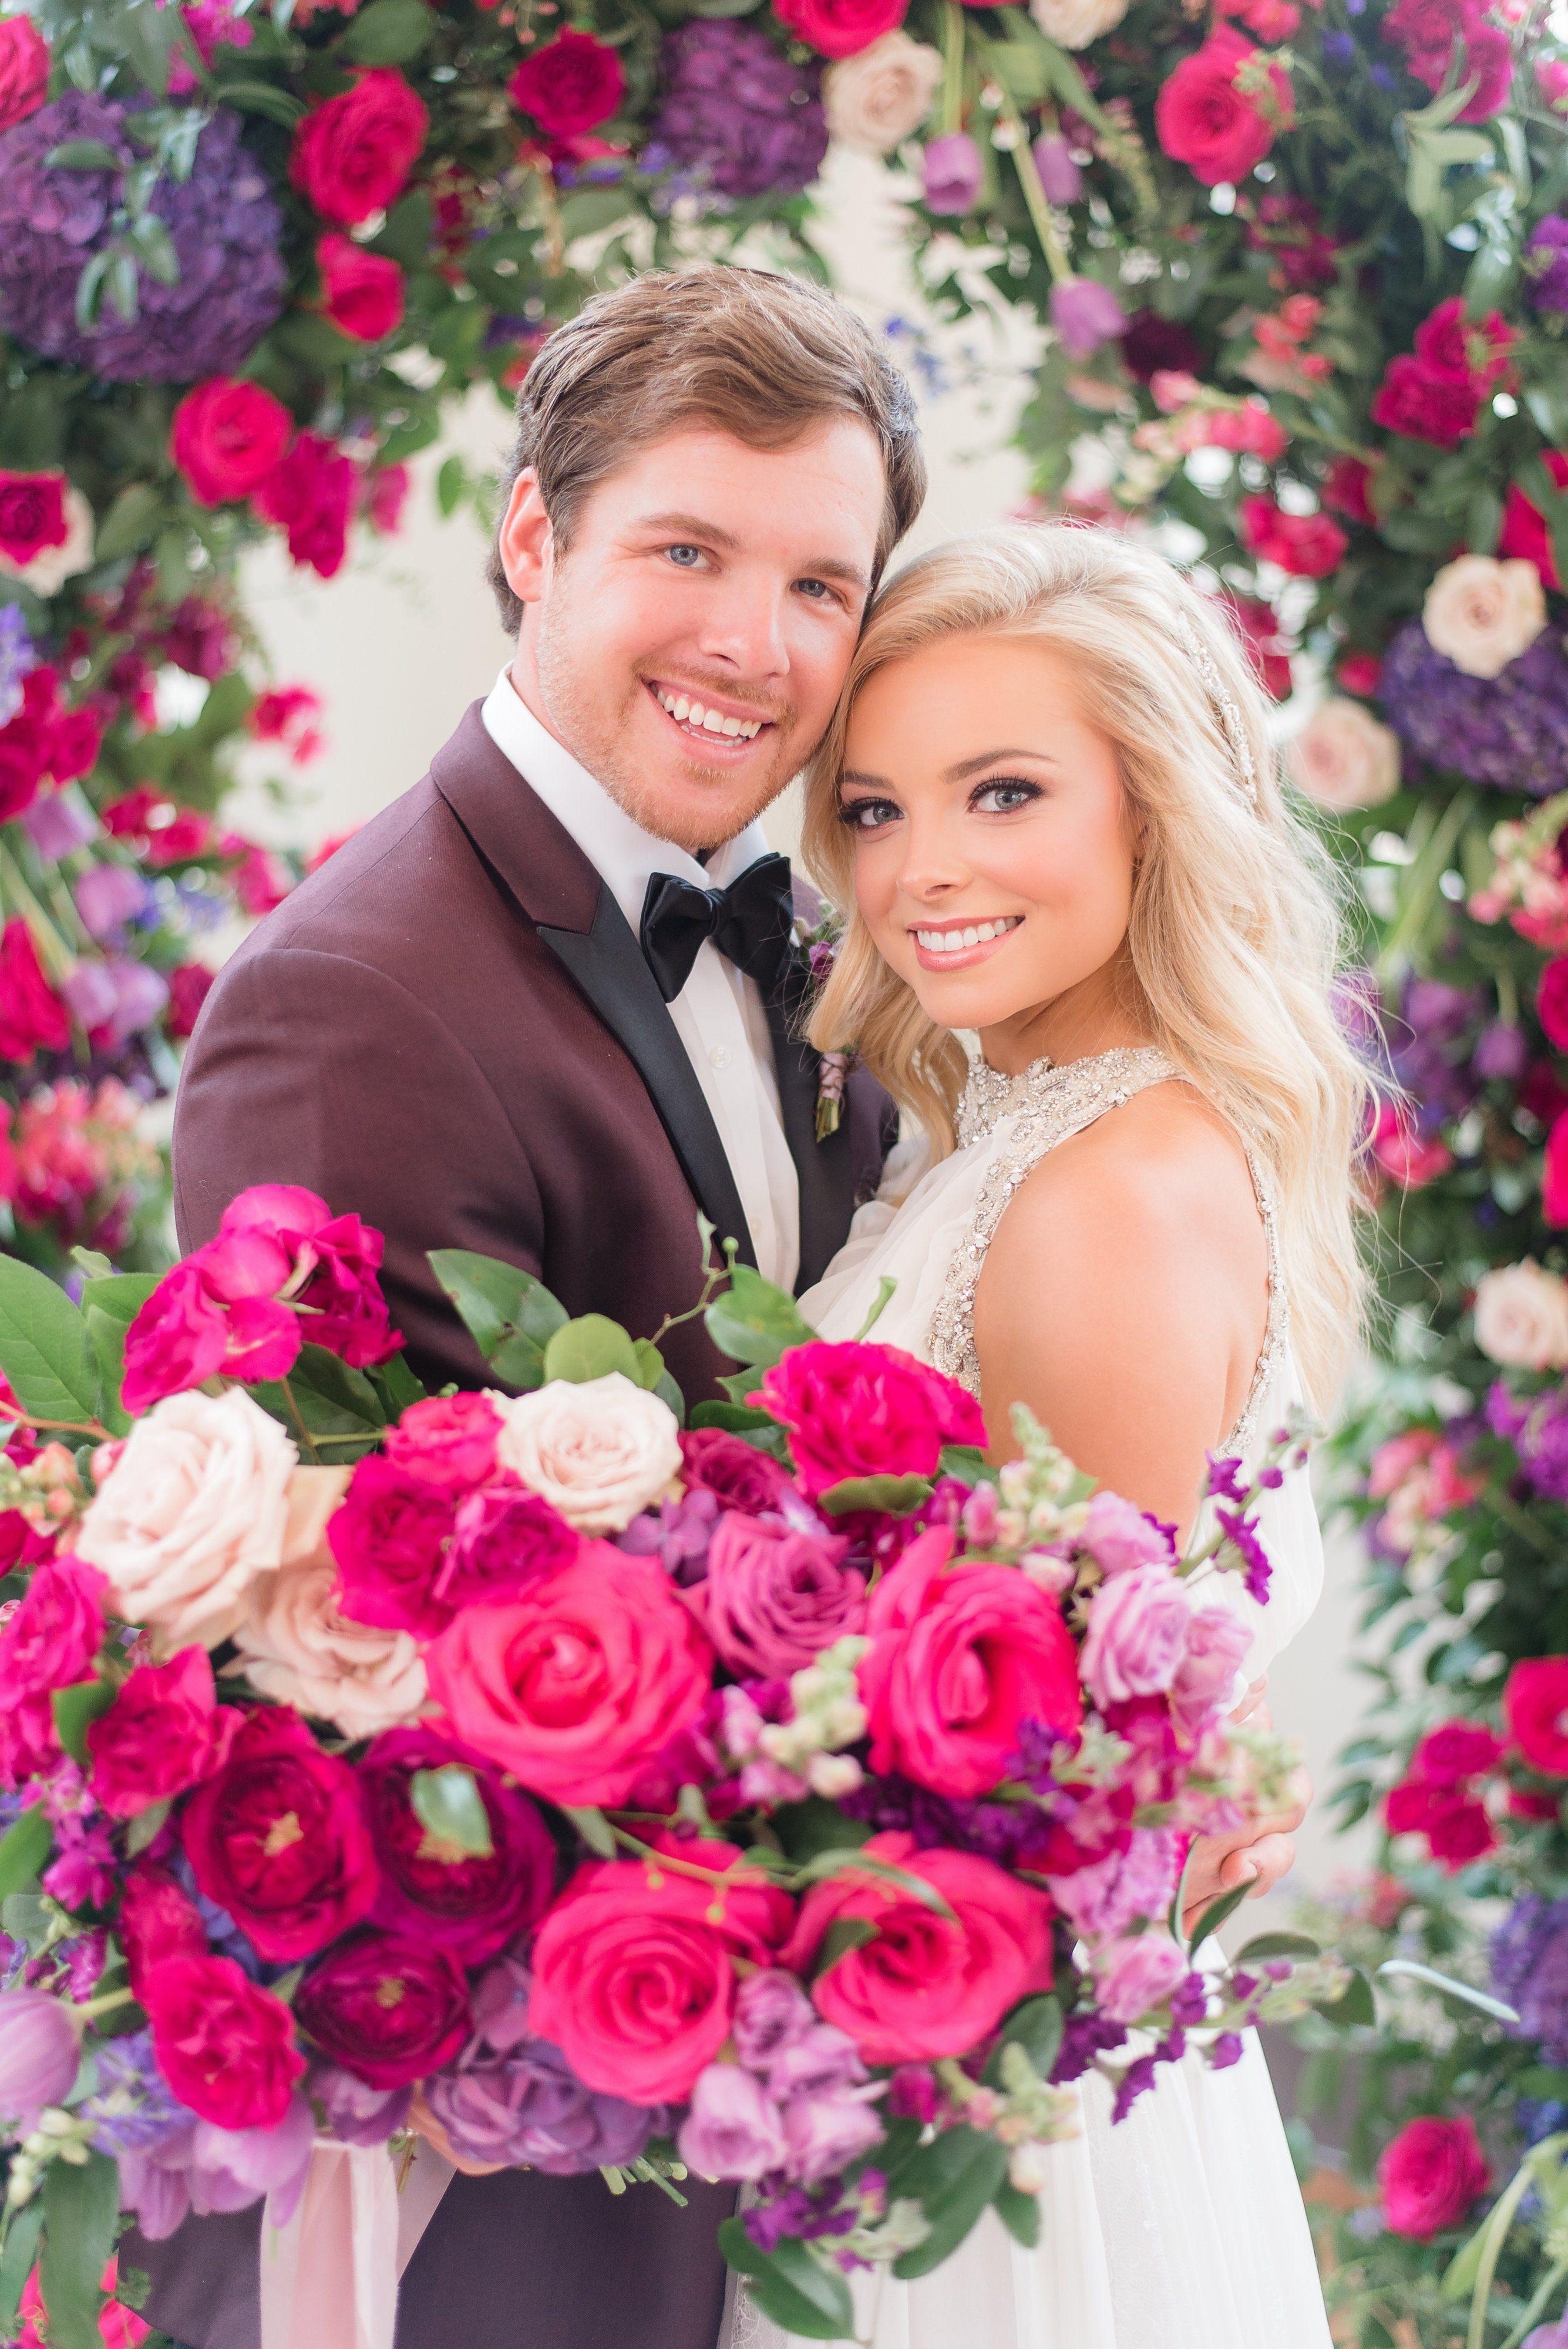 Alabama Weddings Magazine Style Series Shoot With Magnolia Vine Events Jewelry Bromberg S Hair